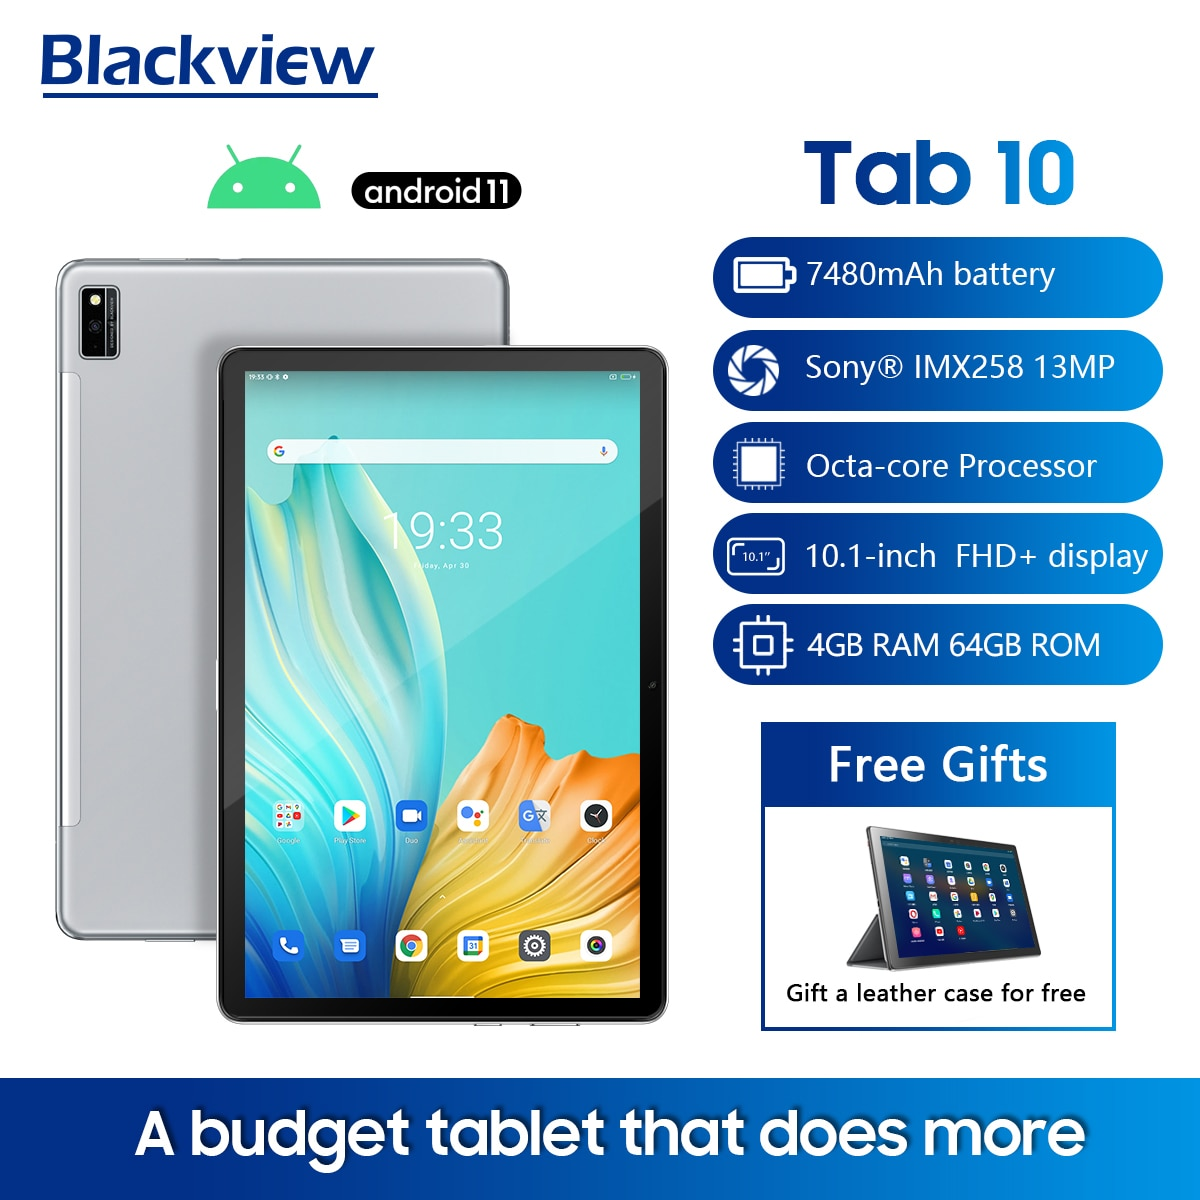 "Blackview TAB 10 Android 11 Tablet 10.1"" MTK8768 Octa Core 1920x1200 4GB RAM 64GB ROM 4G Network Tablets PC Dual WIFI 7480mAh"